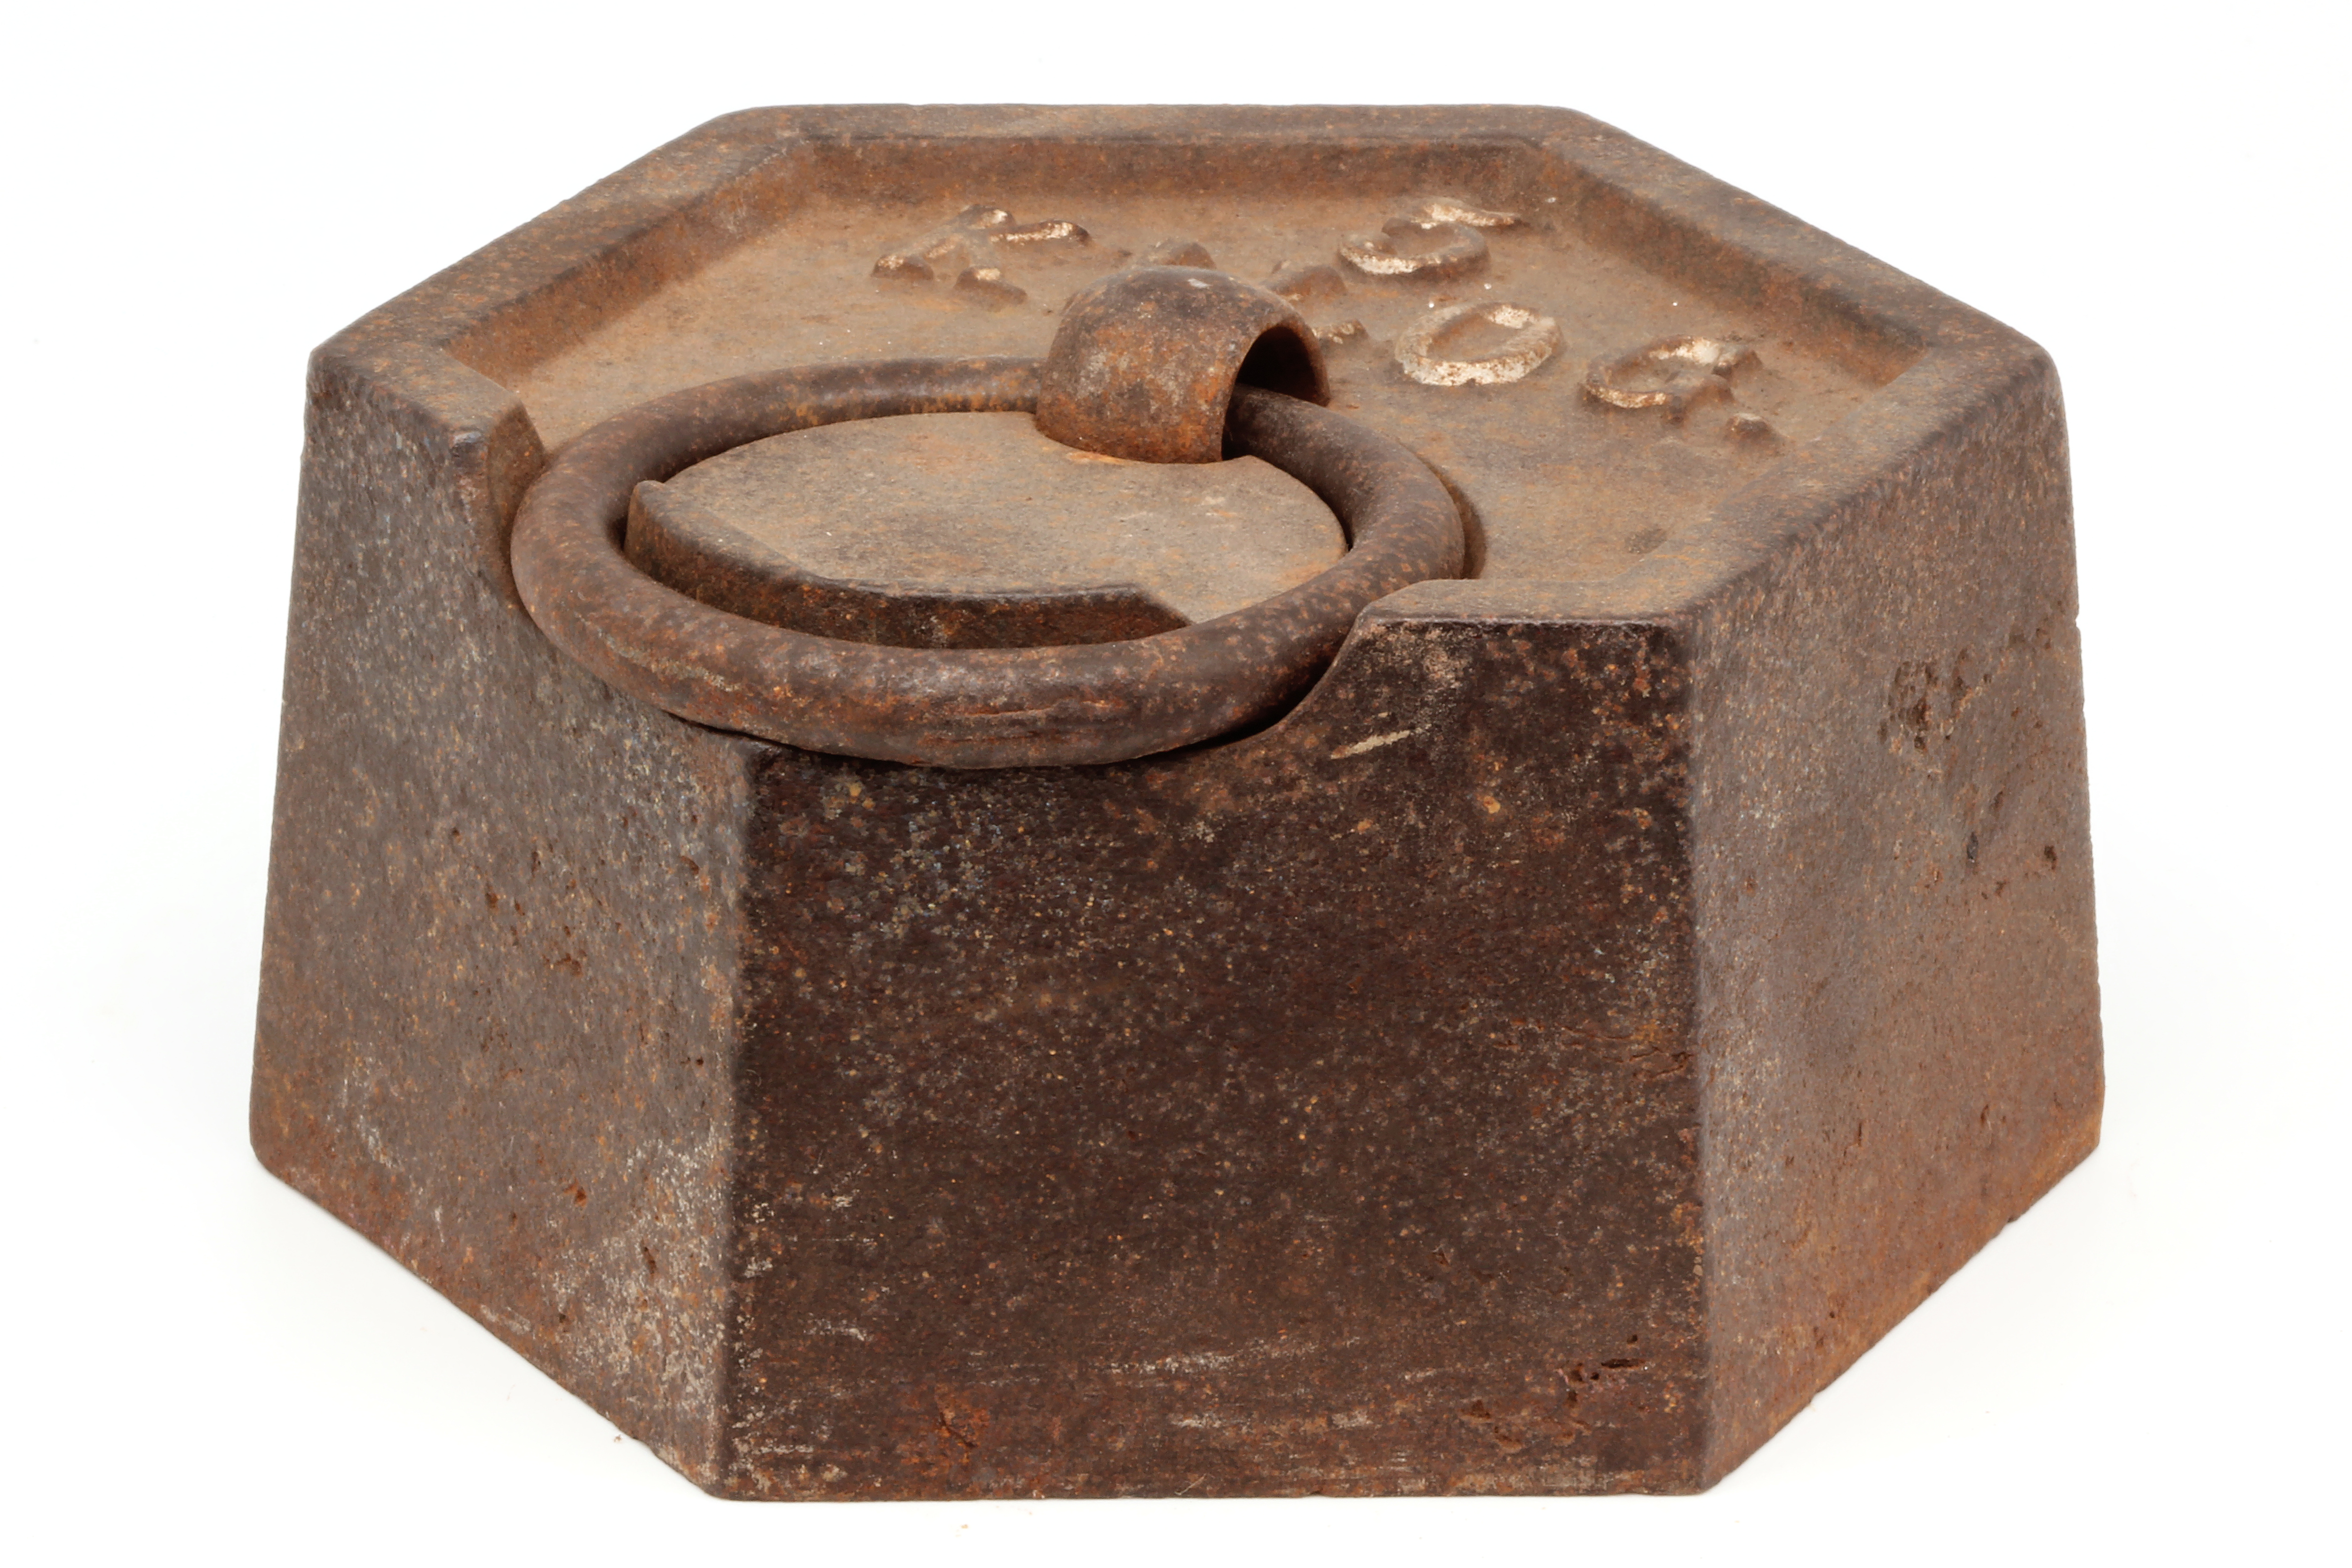 File poids fonte 5 kg wikimedia commons - Poids baignoire fonte ...